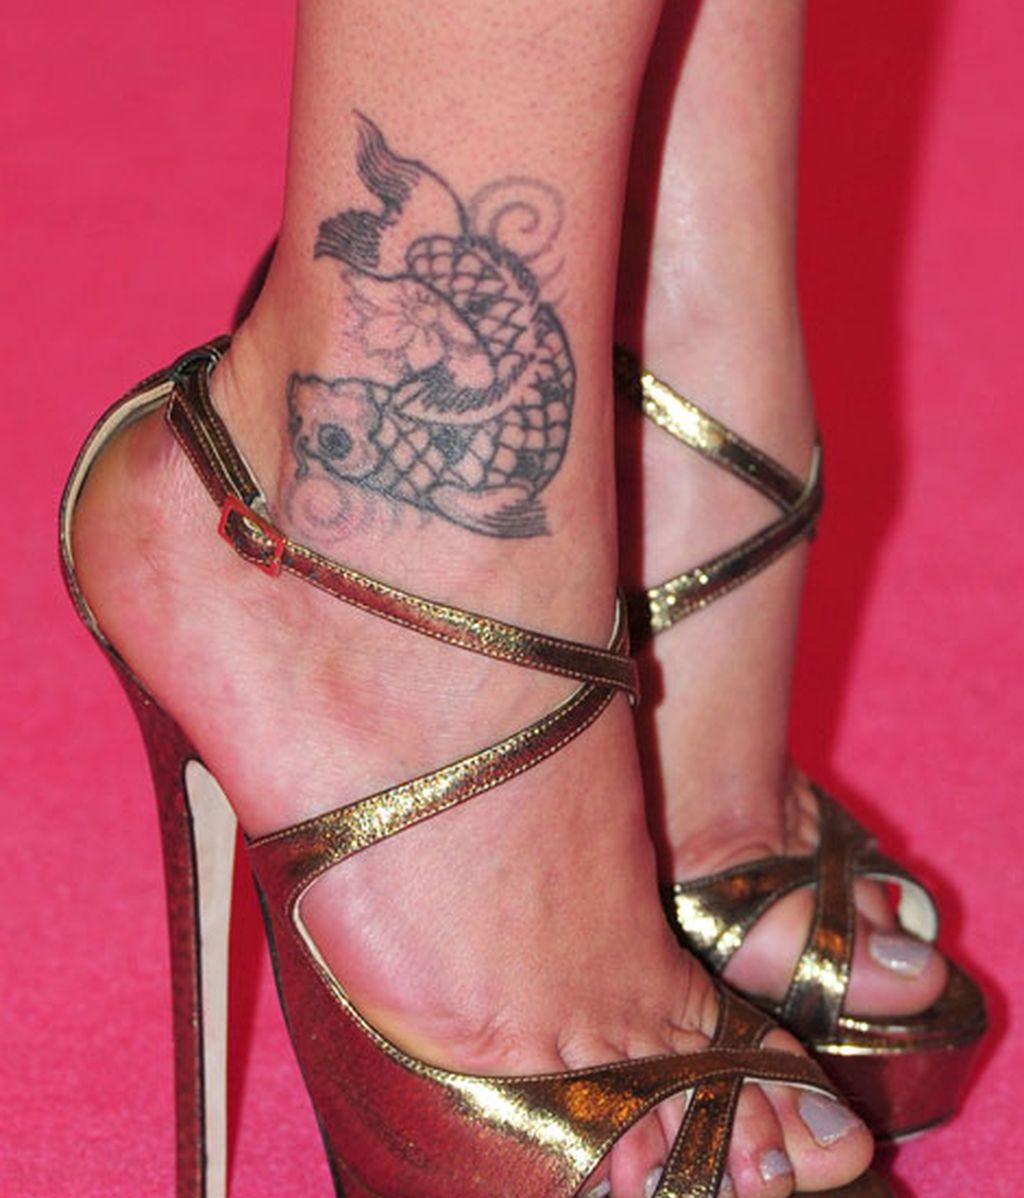 Las sandalias doradas de María León